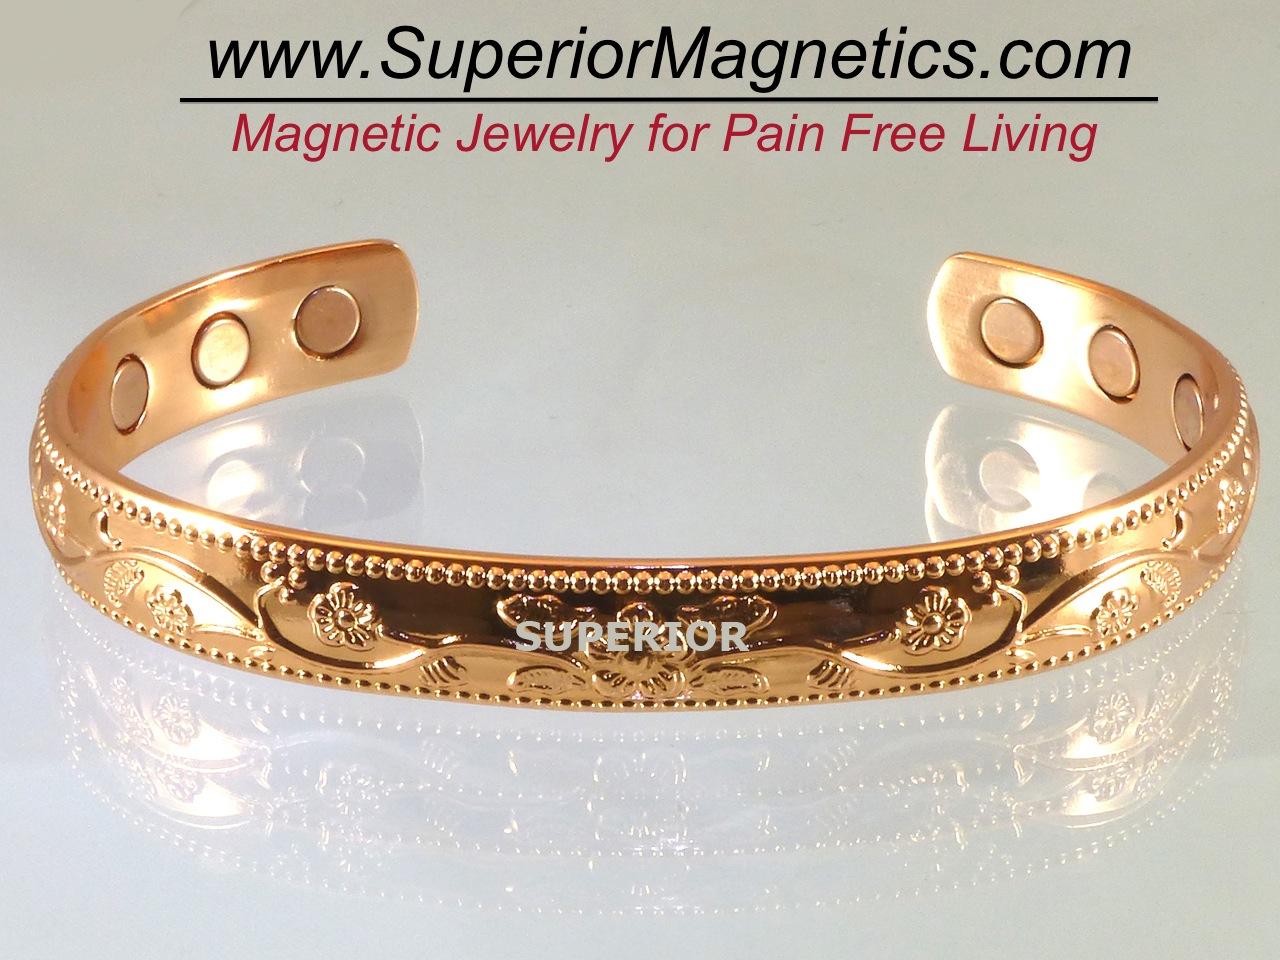 Superior Magnetics Announces New Copper Magnetic Bracelet For Pain Relief